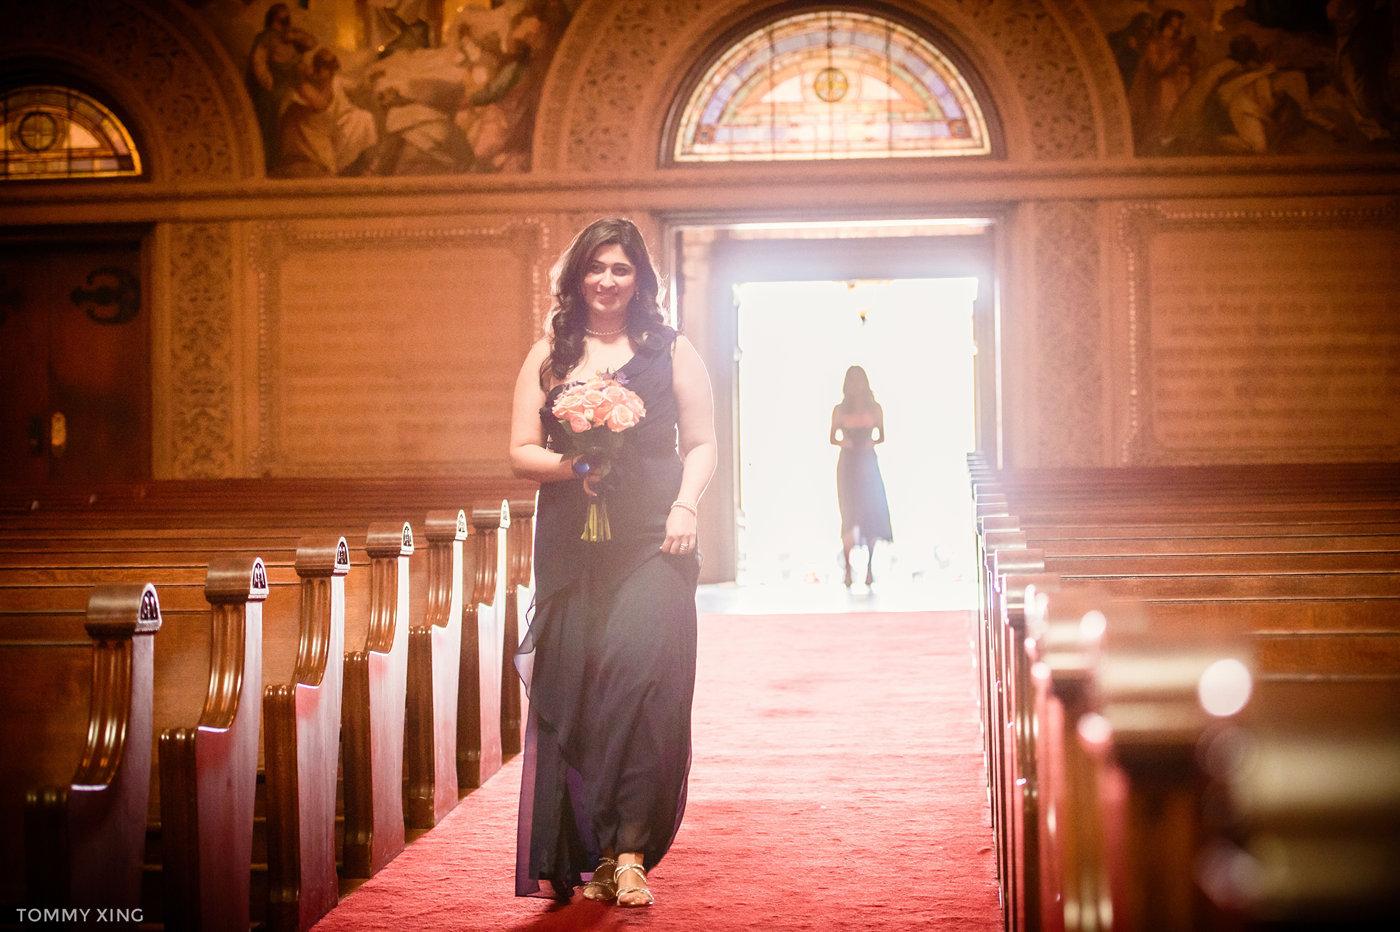 STANFORD MEMORIAL CHURCH WEDDING - Wenjie & Chengcheng - SAN FRANCISCO BAY AREA 斯坦福教堂婚礼跟拍 - 洛杉矶婚礼婚纱照摄影师 Tommy Xing Photography065.jpg